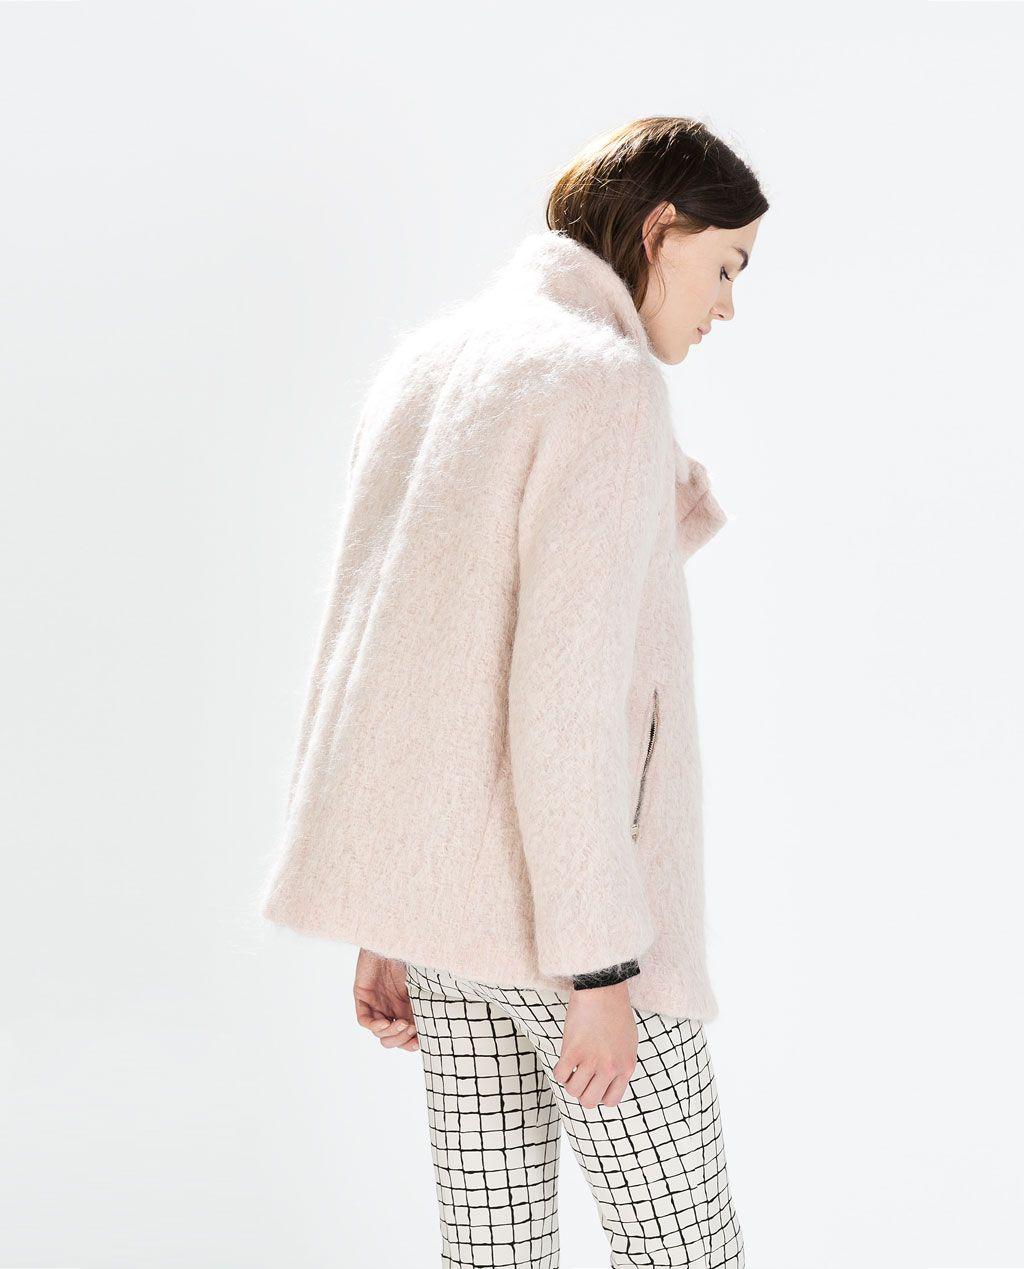 aa7400f0 ZARA - WOMAN - COAT WITH FUNNEL COLLAR | Style | Outerwear women ...